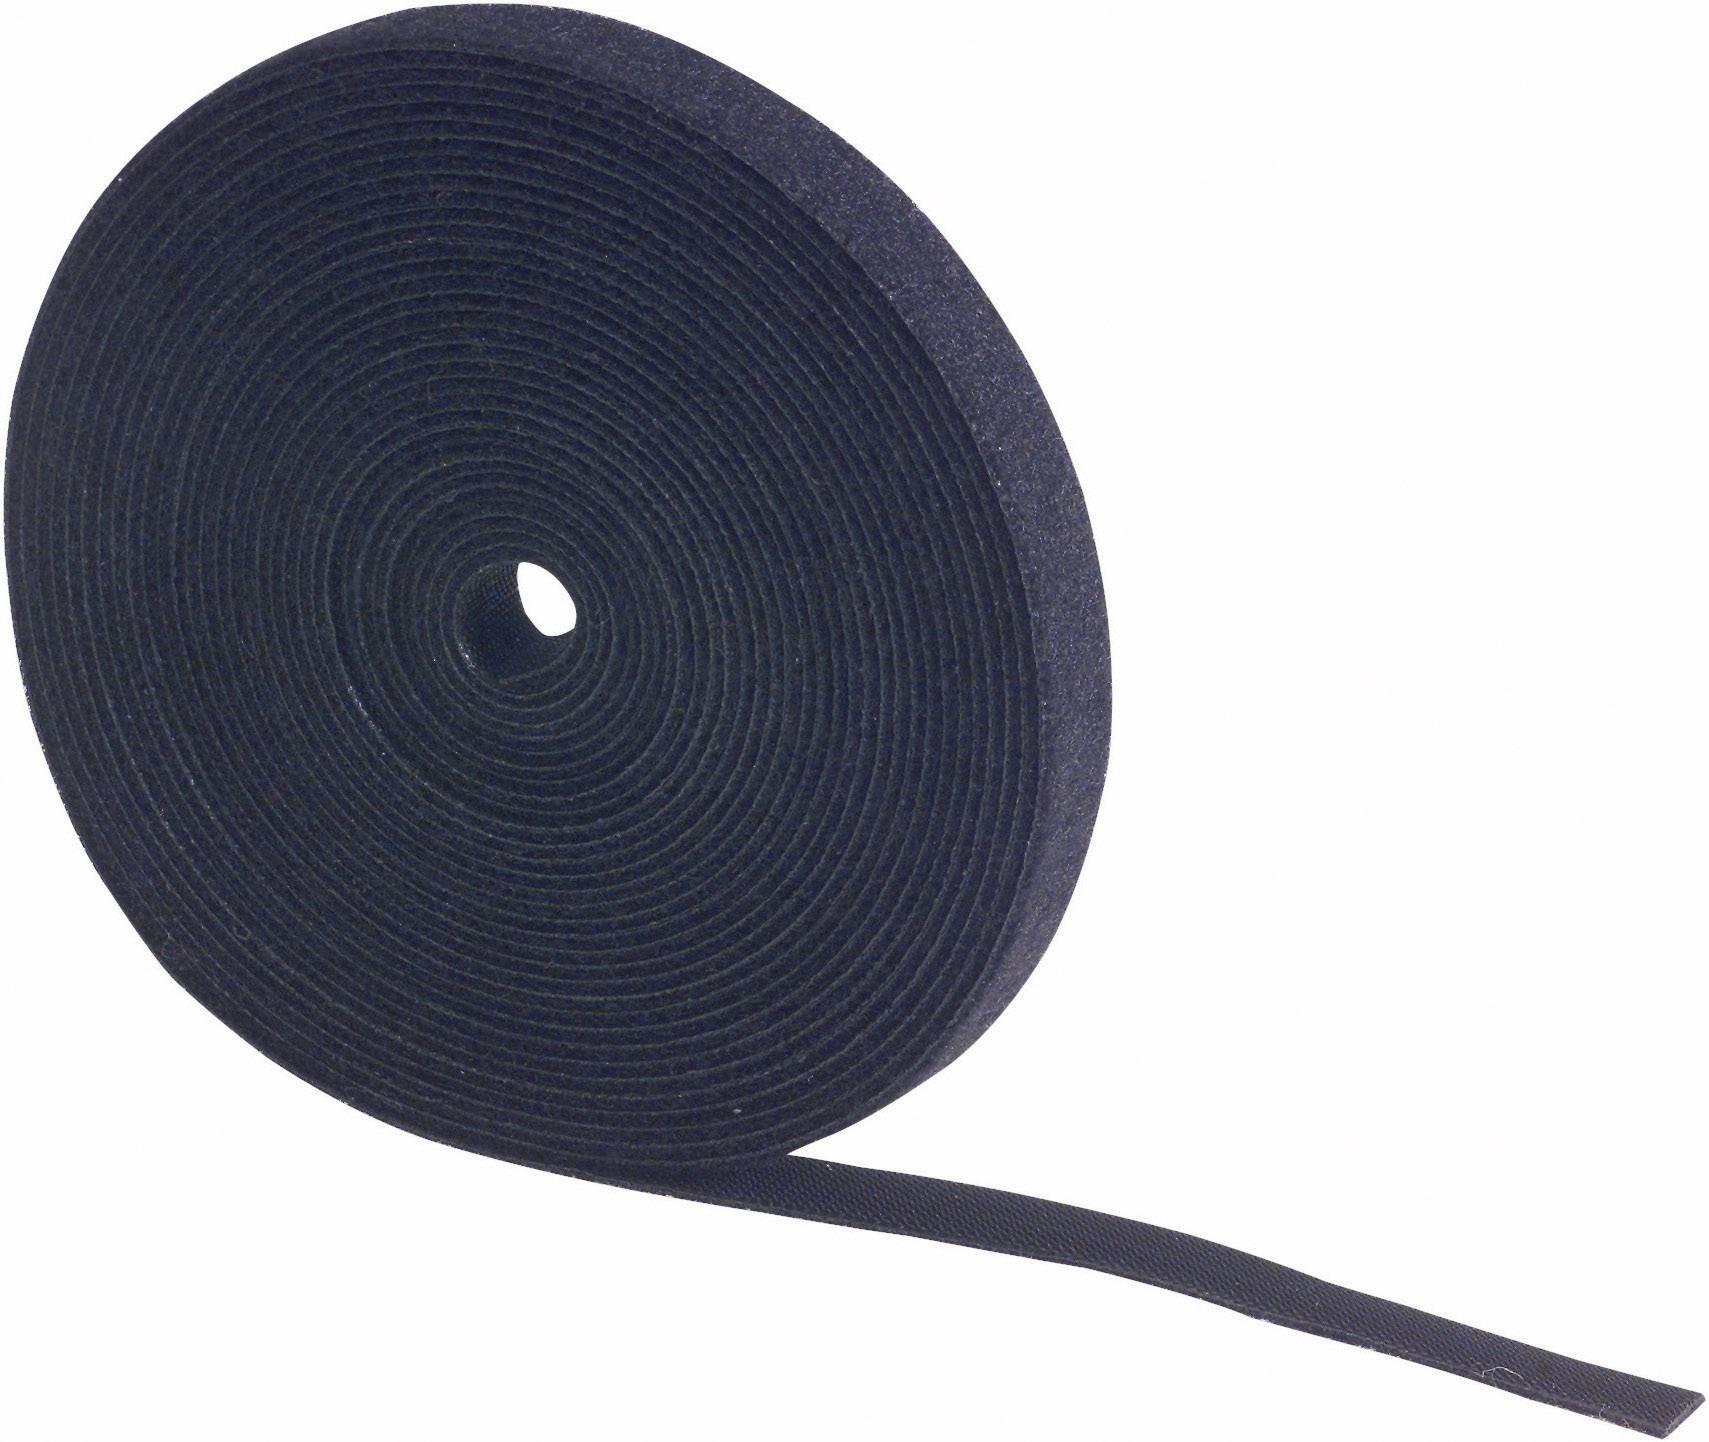 Páska se suchým zipem, Fastech 910-330C, černá, 1 m x 20 mm